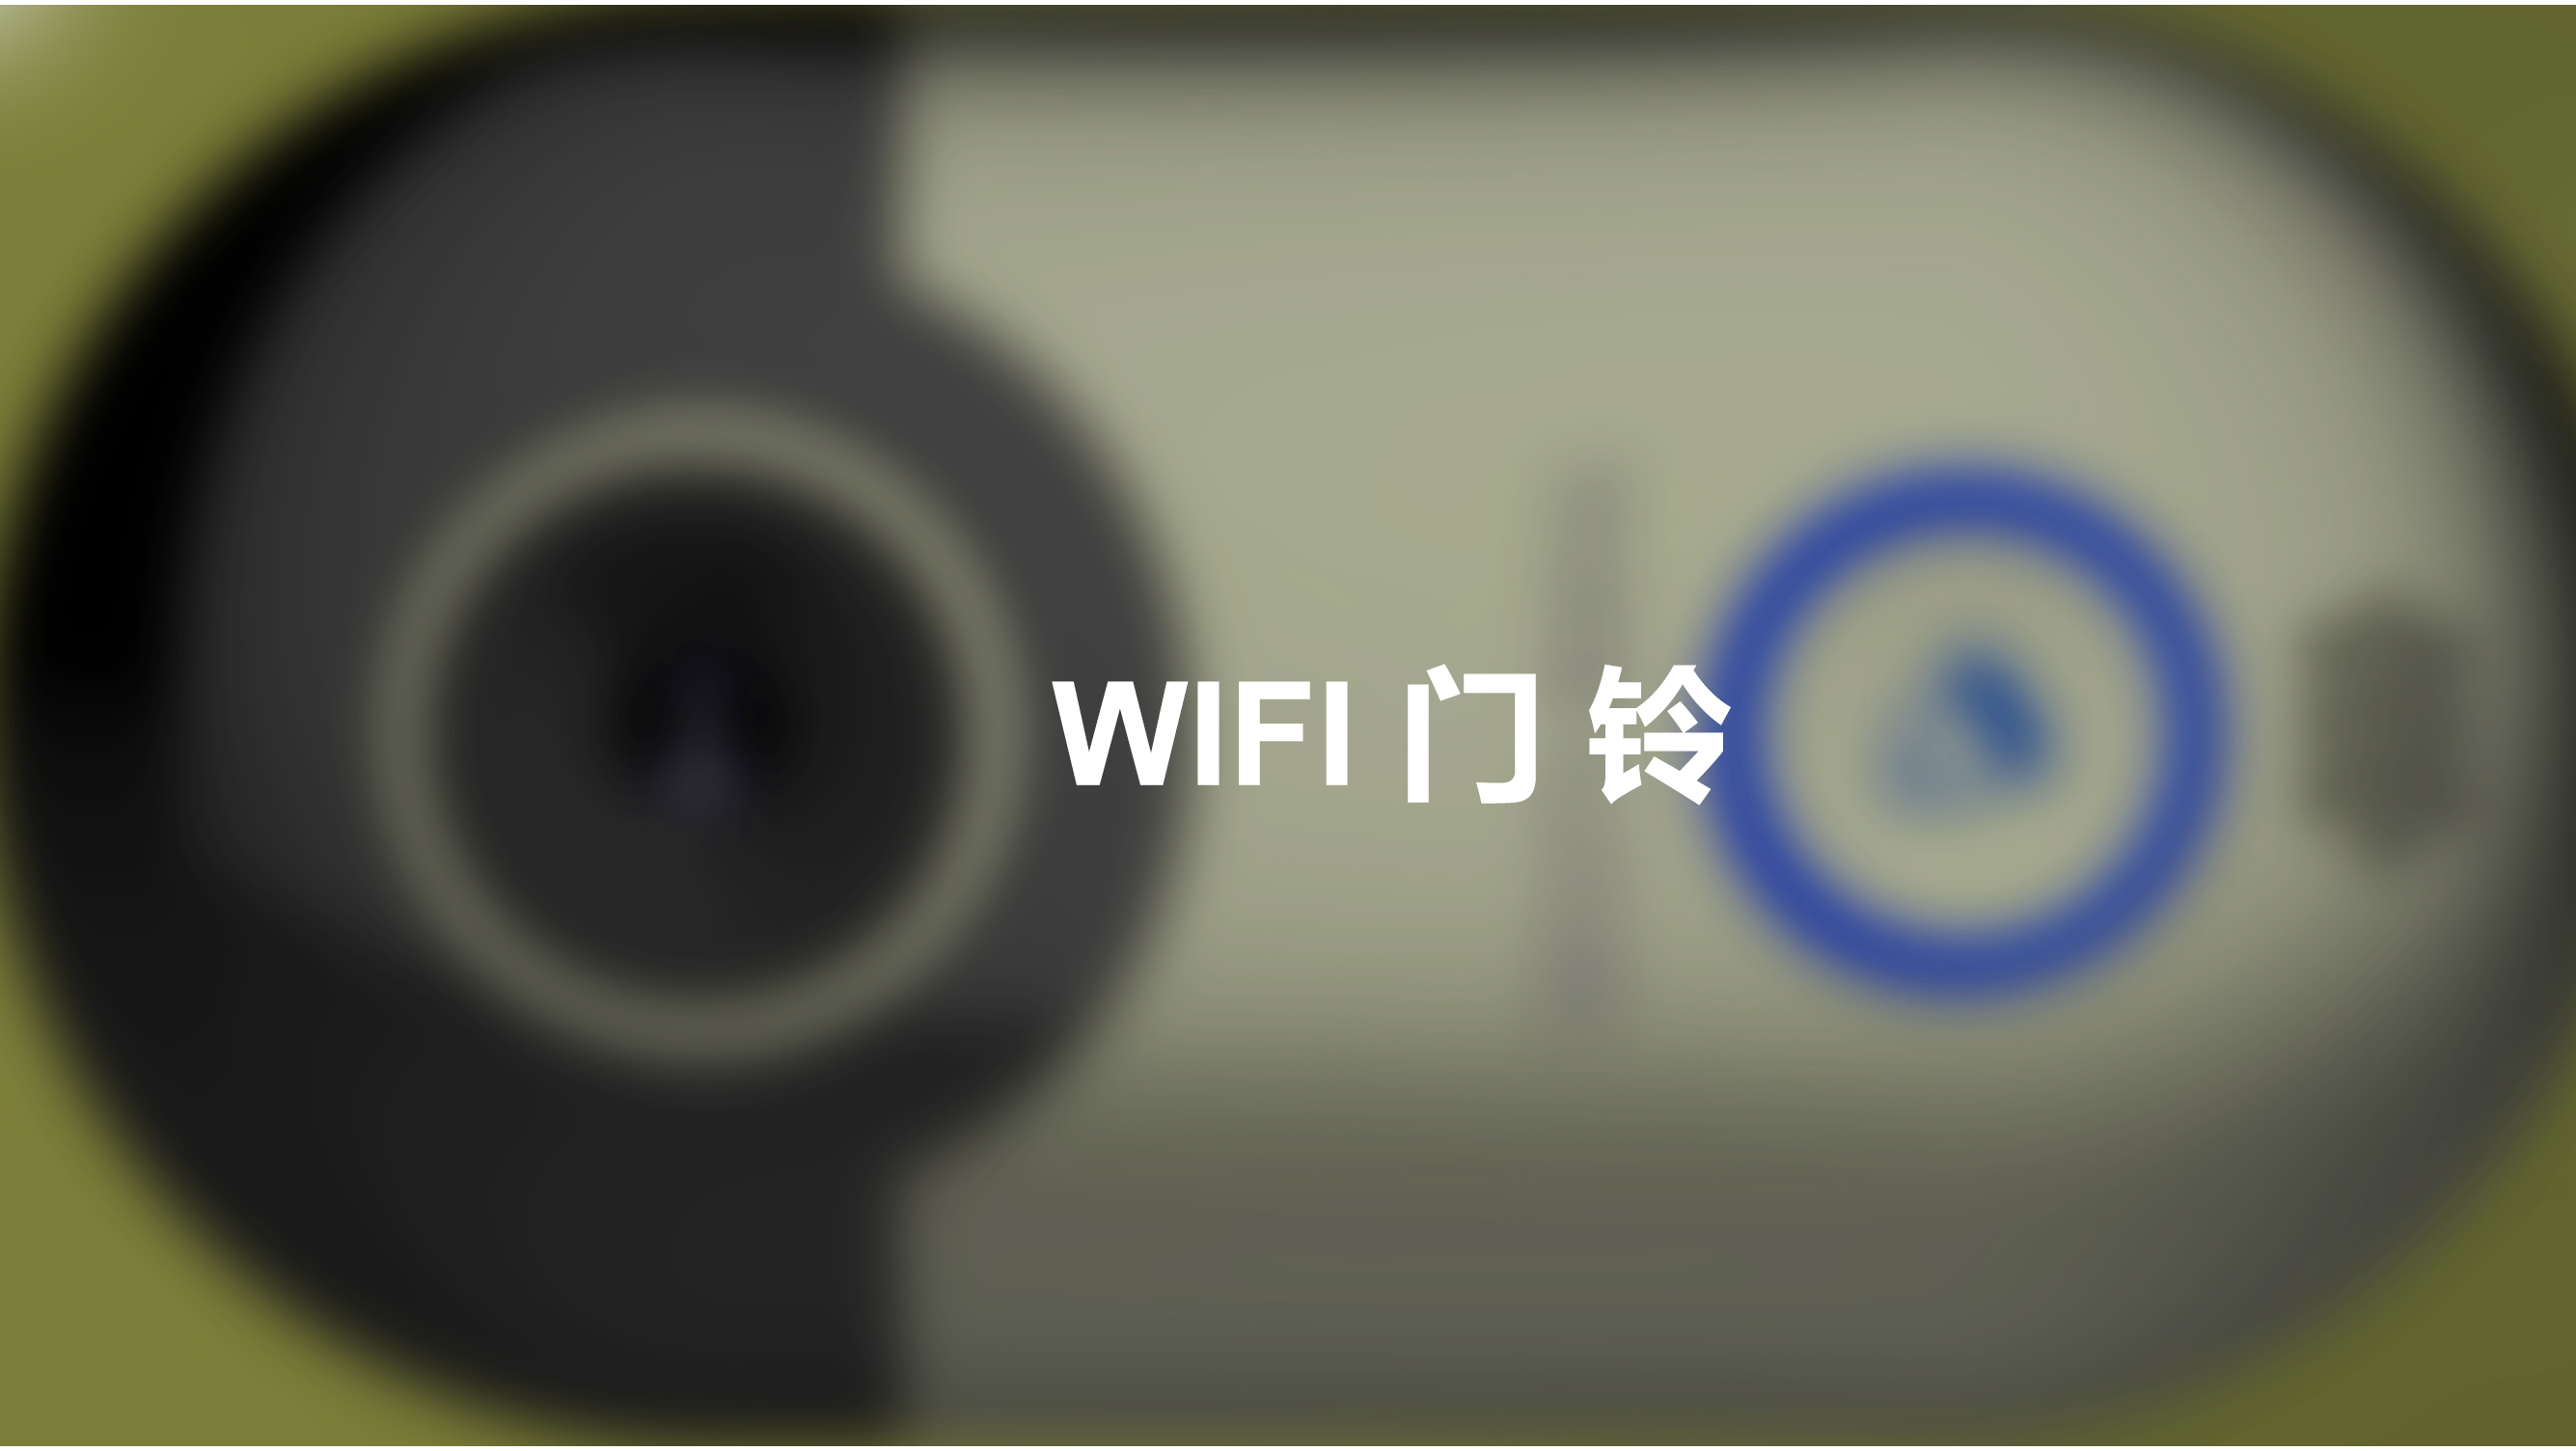 wifi门铃-(点击更多图片)